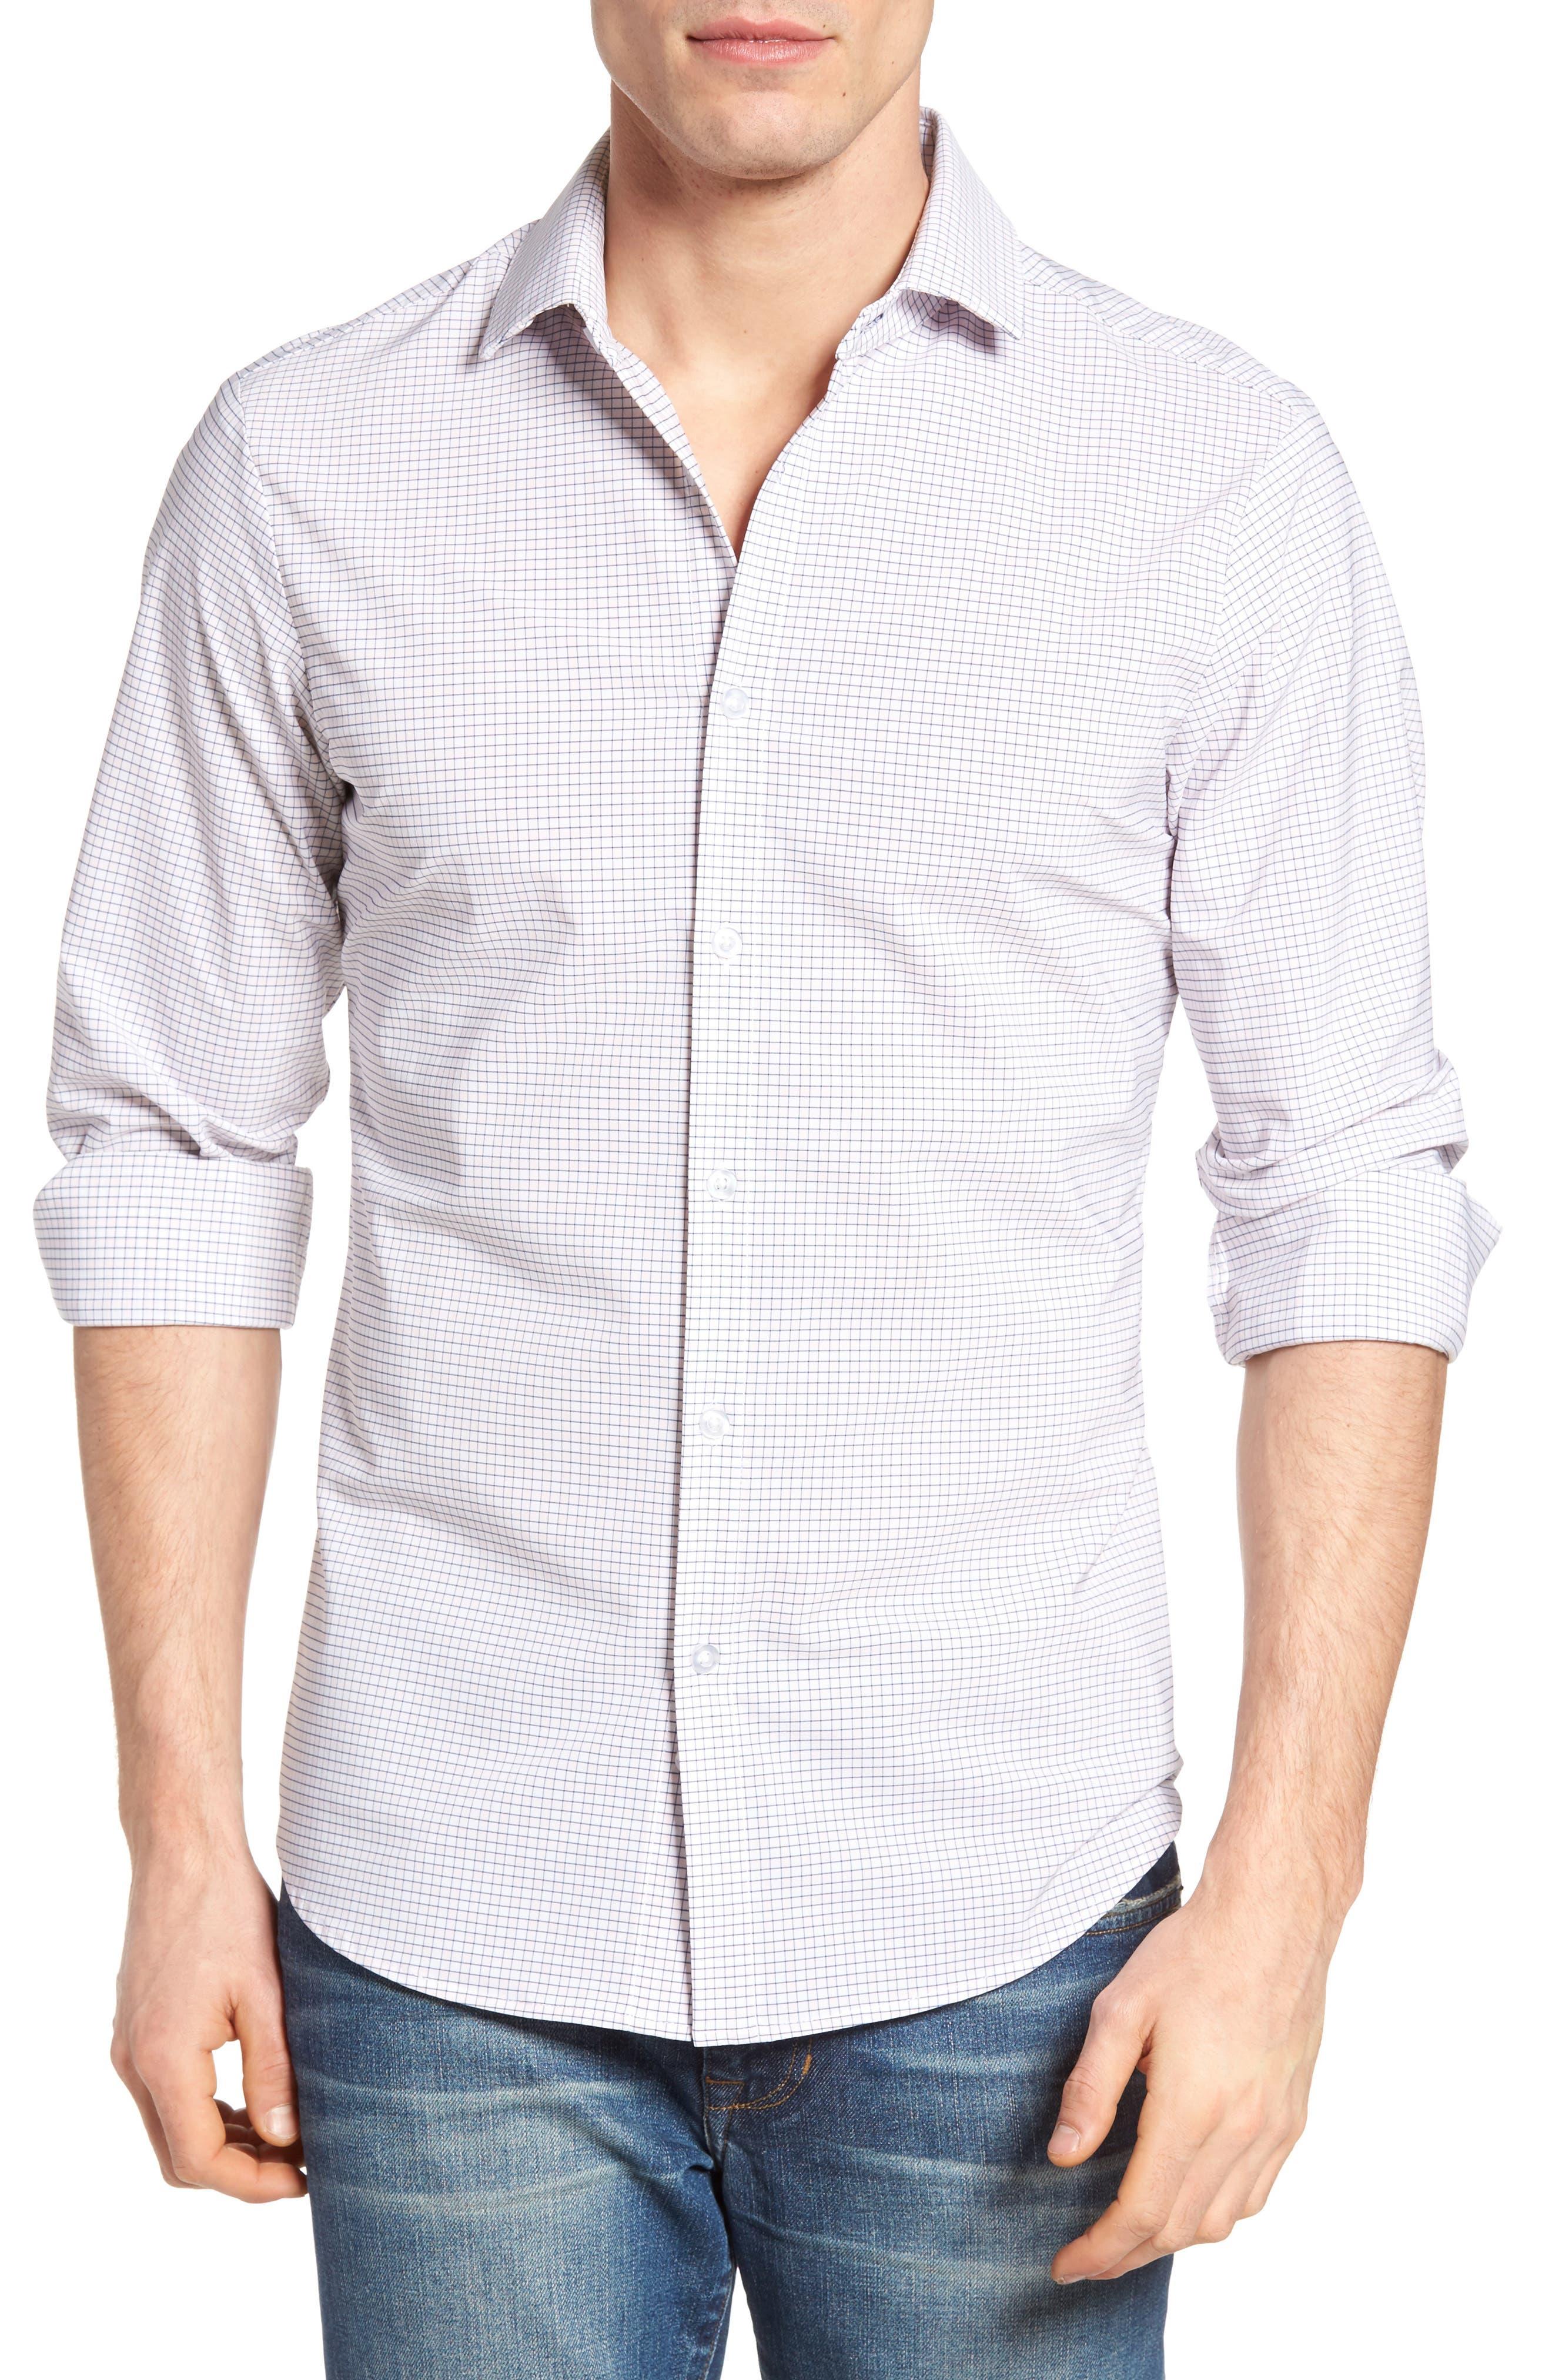 Alternate Image 1 Selected - Mizzen+Main Fowler Illusion Gingham Performance Sport Shirt